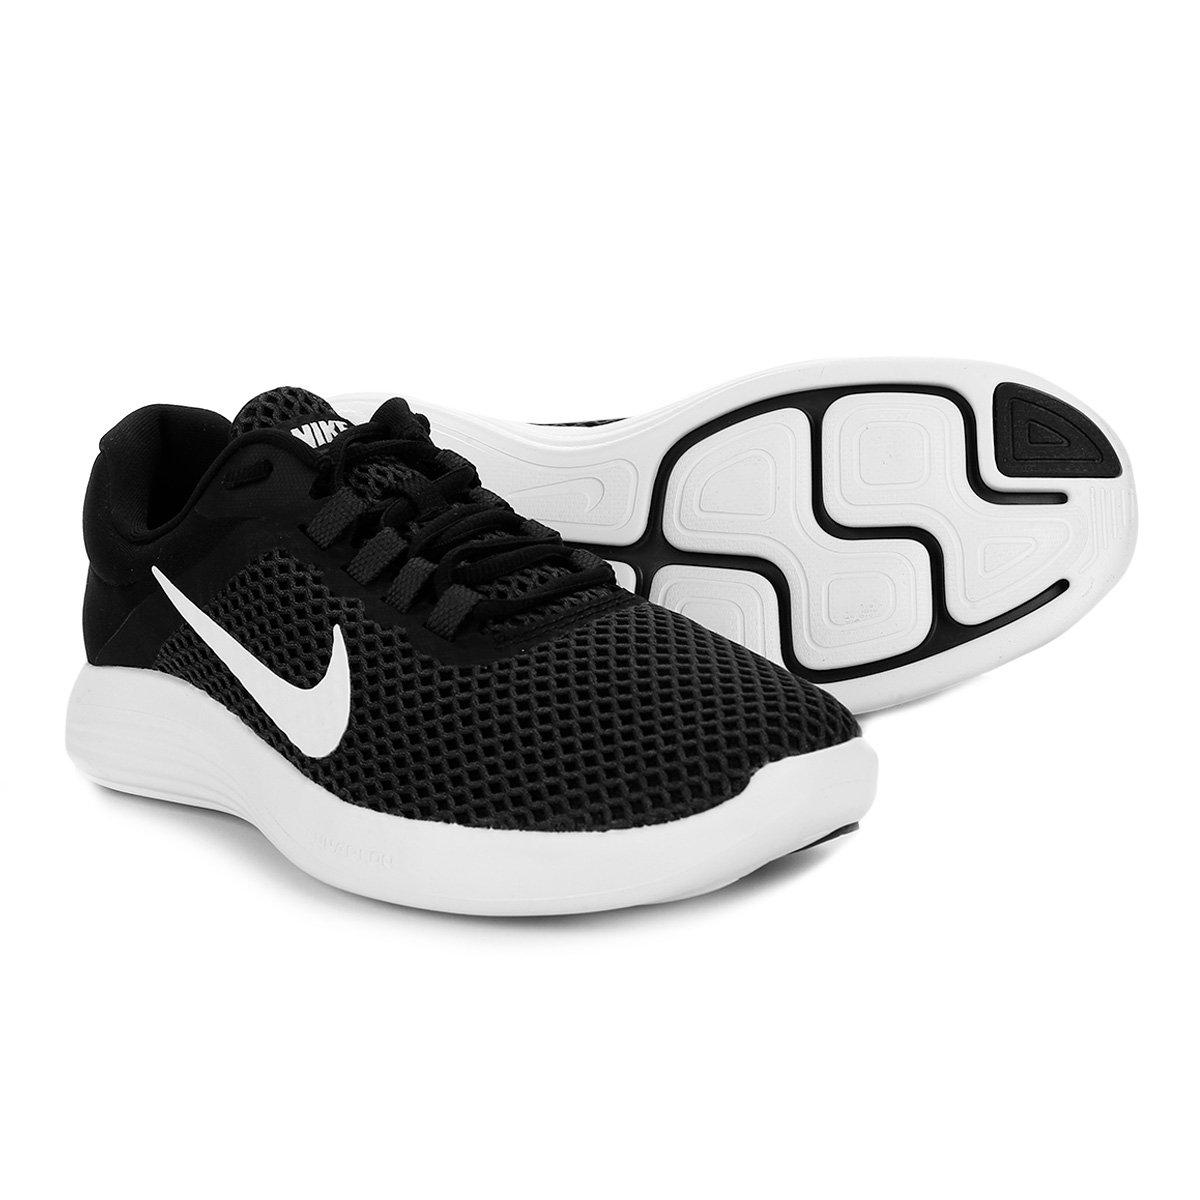 Tênis Nike Lunarconverge 2 Masculino - Preto e Branco